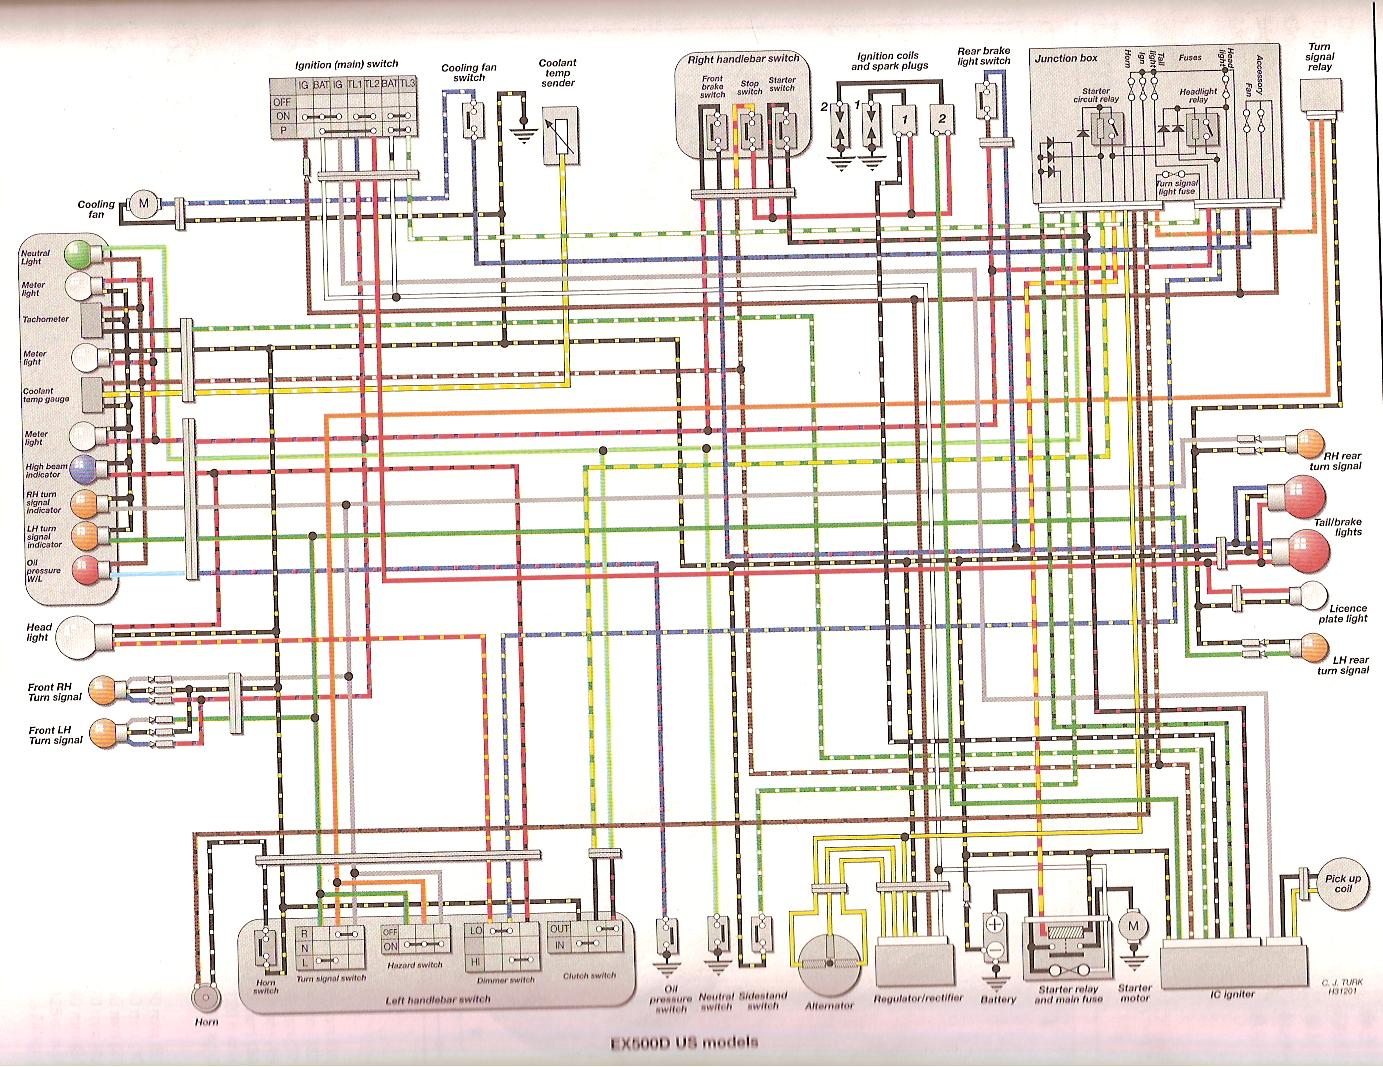 Kawasaki Ex500 Wiring Diagram Wiring Diagram Provider Provider Frankmotors Es